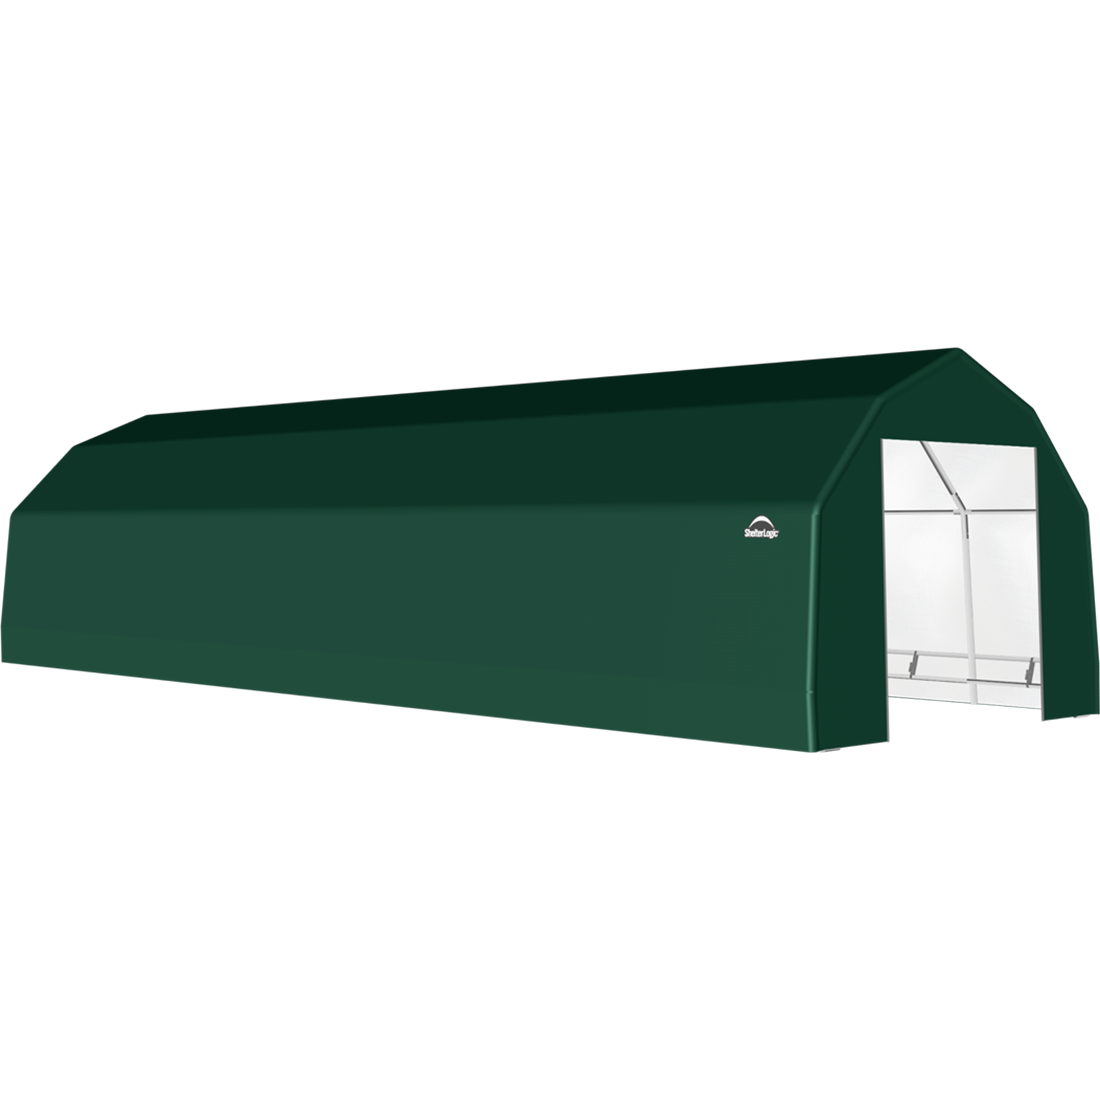 SP Barn 15X40X11 Green 14 oz PE Shelter